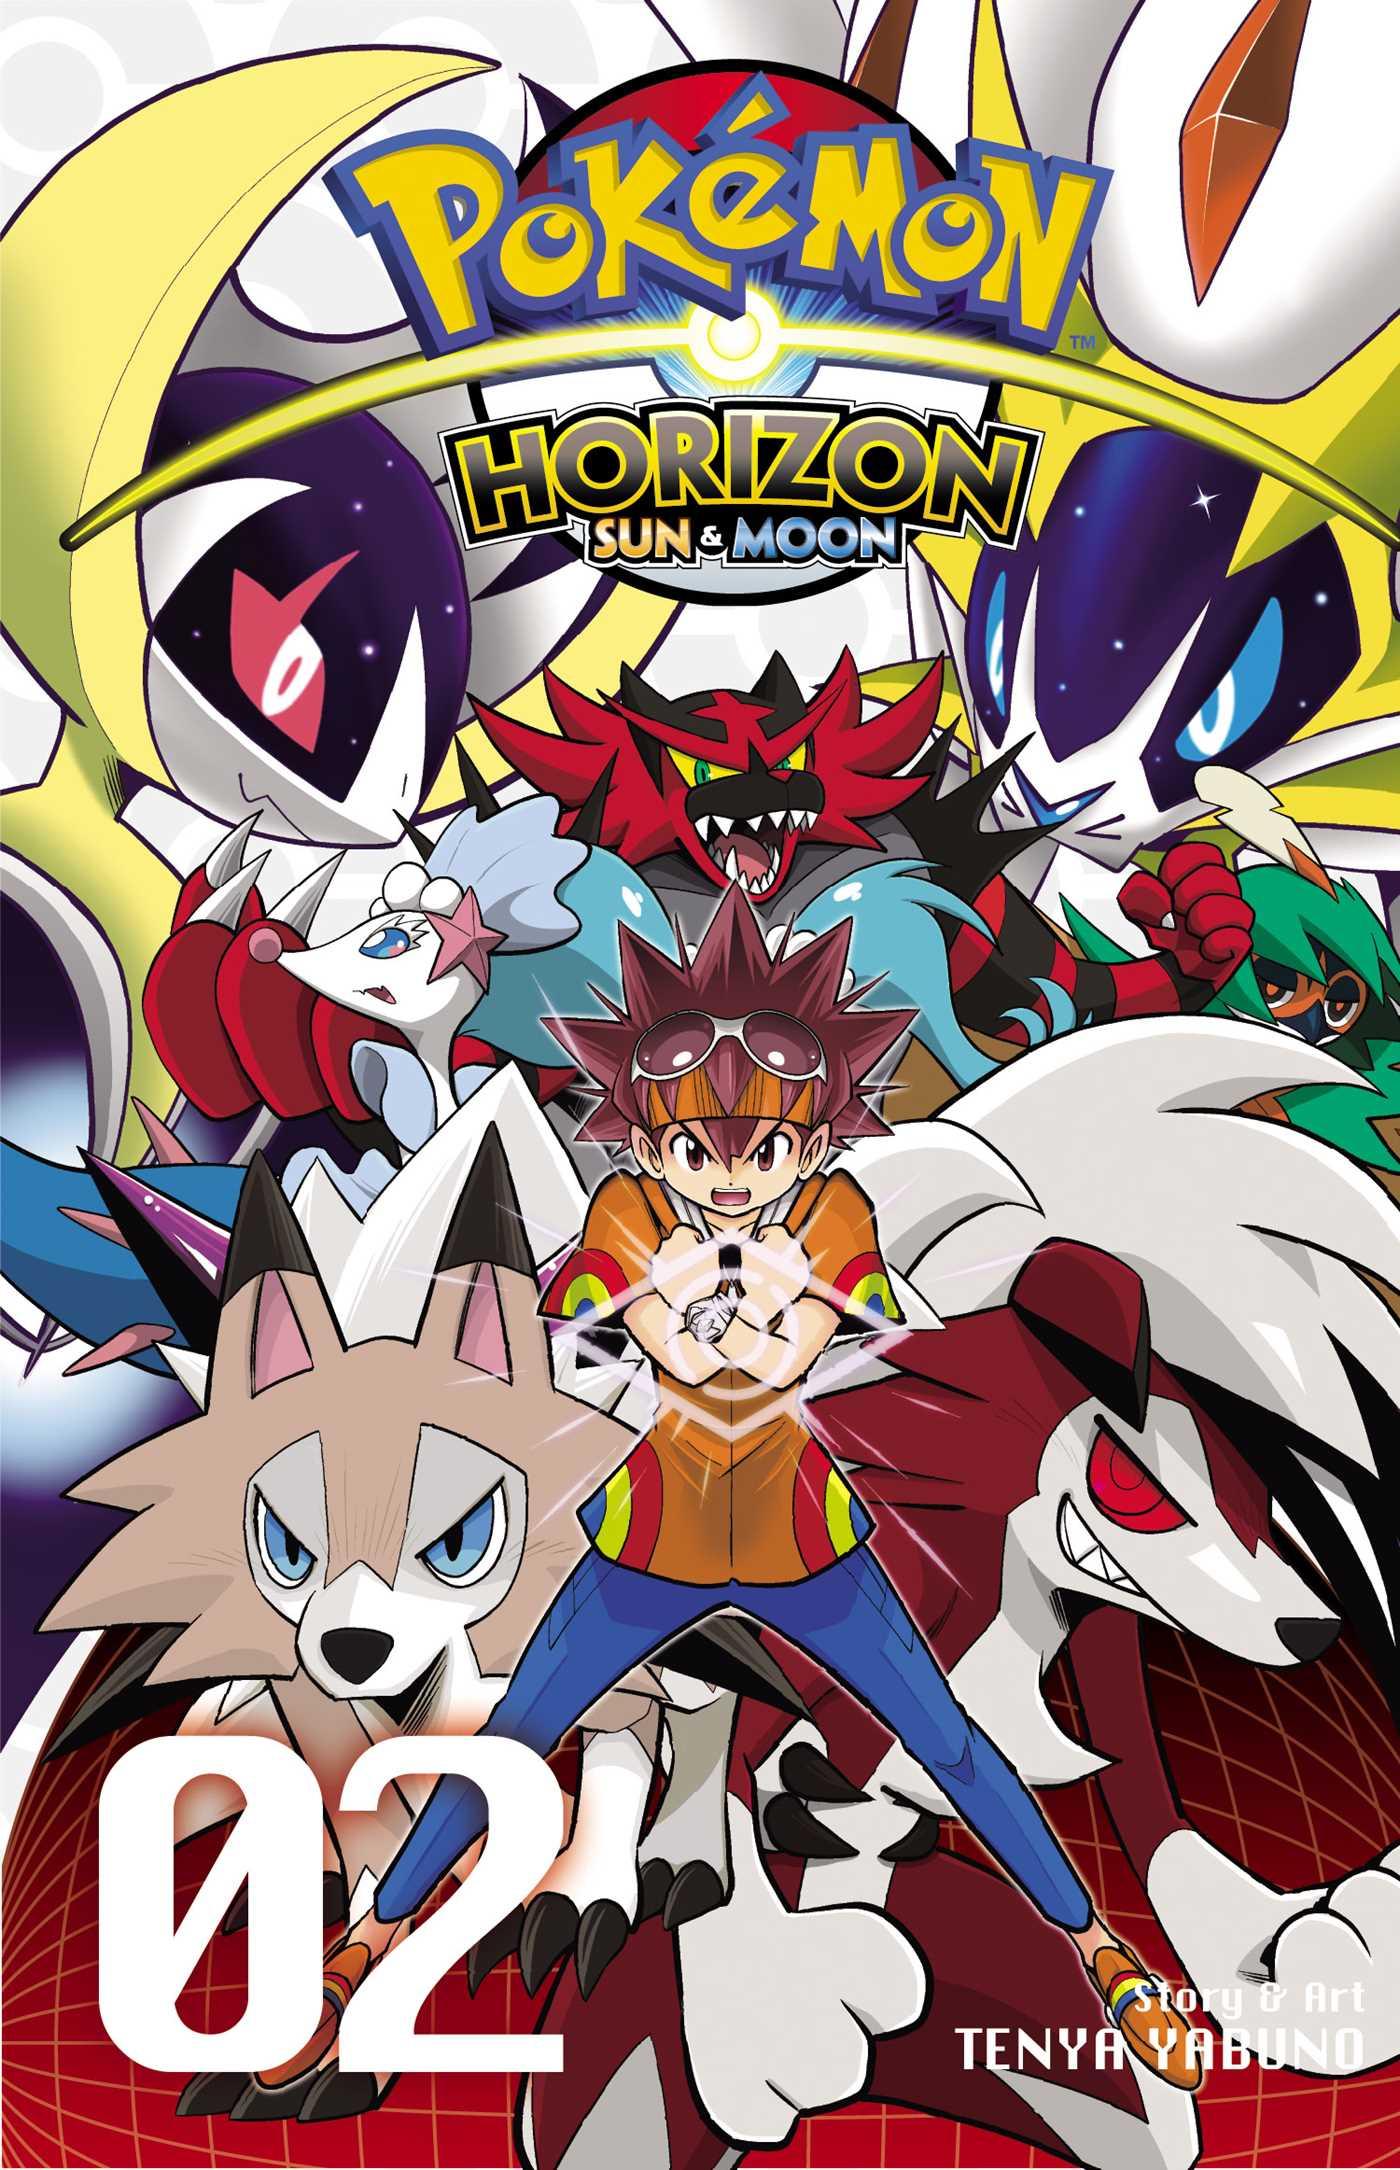 Pokemon Horizon Sun & Moon Manga Vol. 2 @Archonia_US